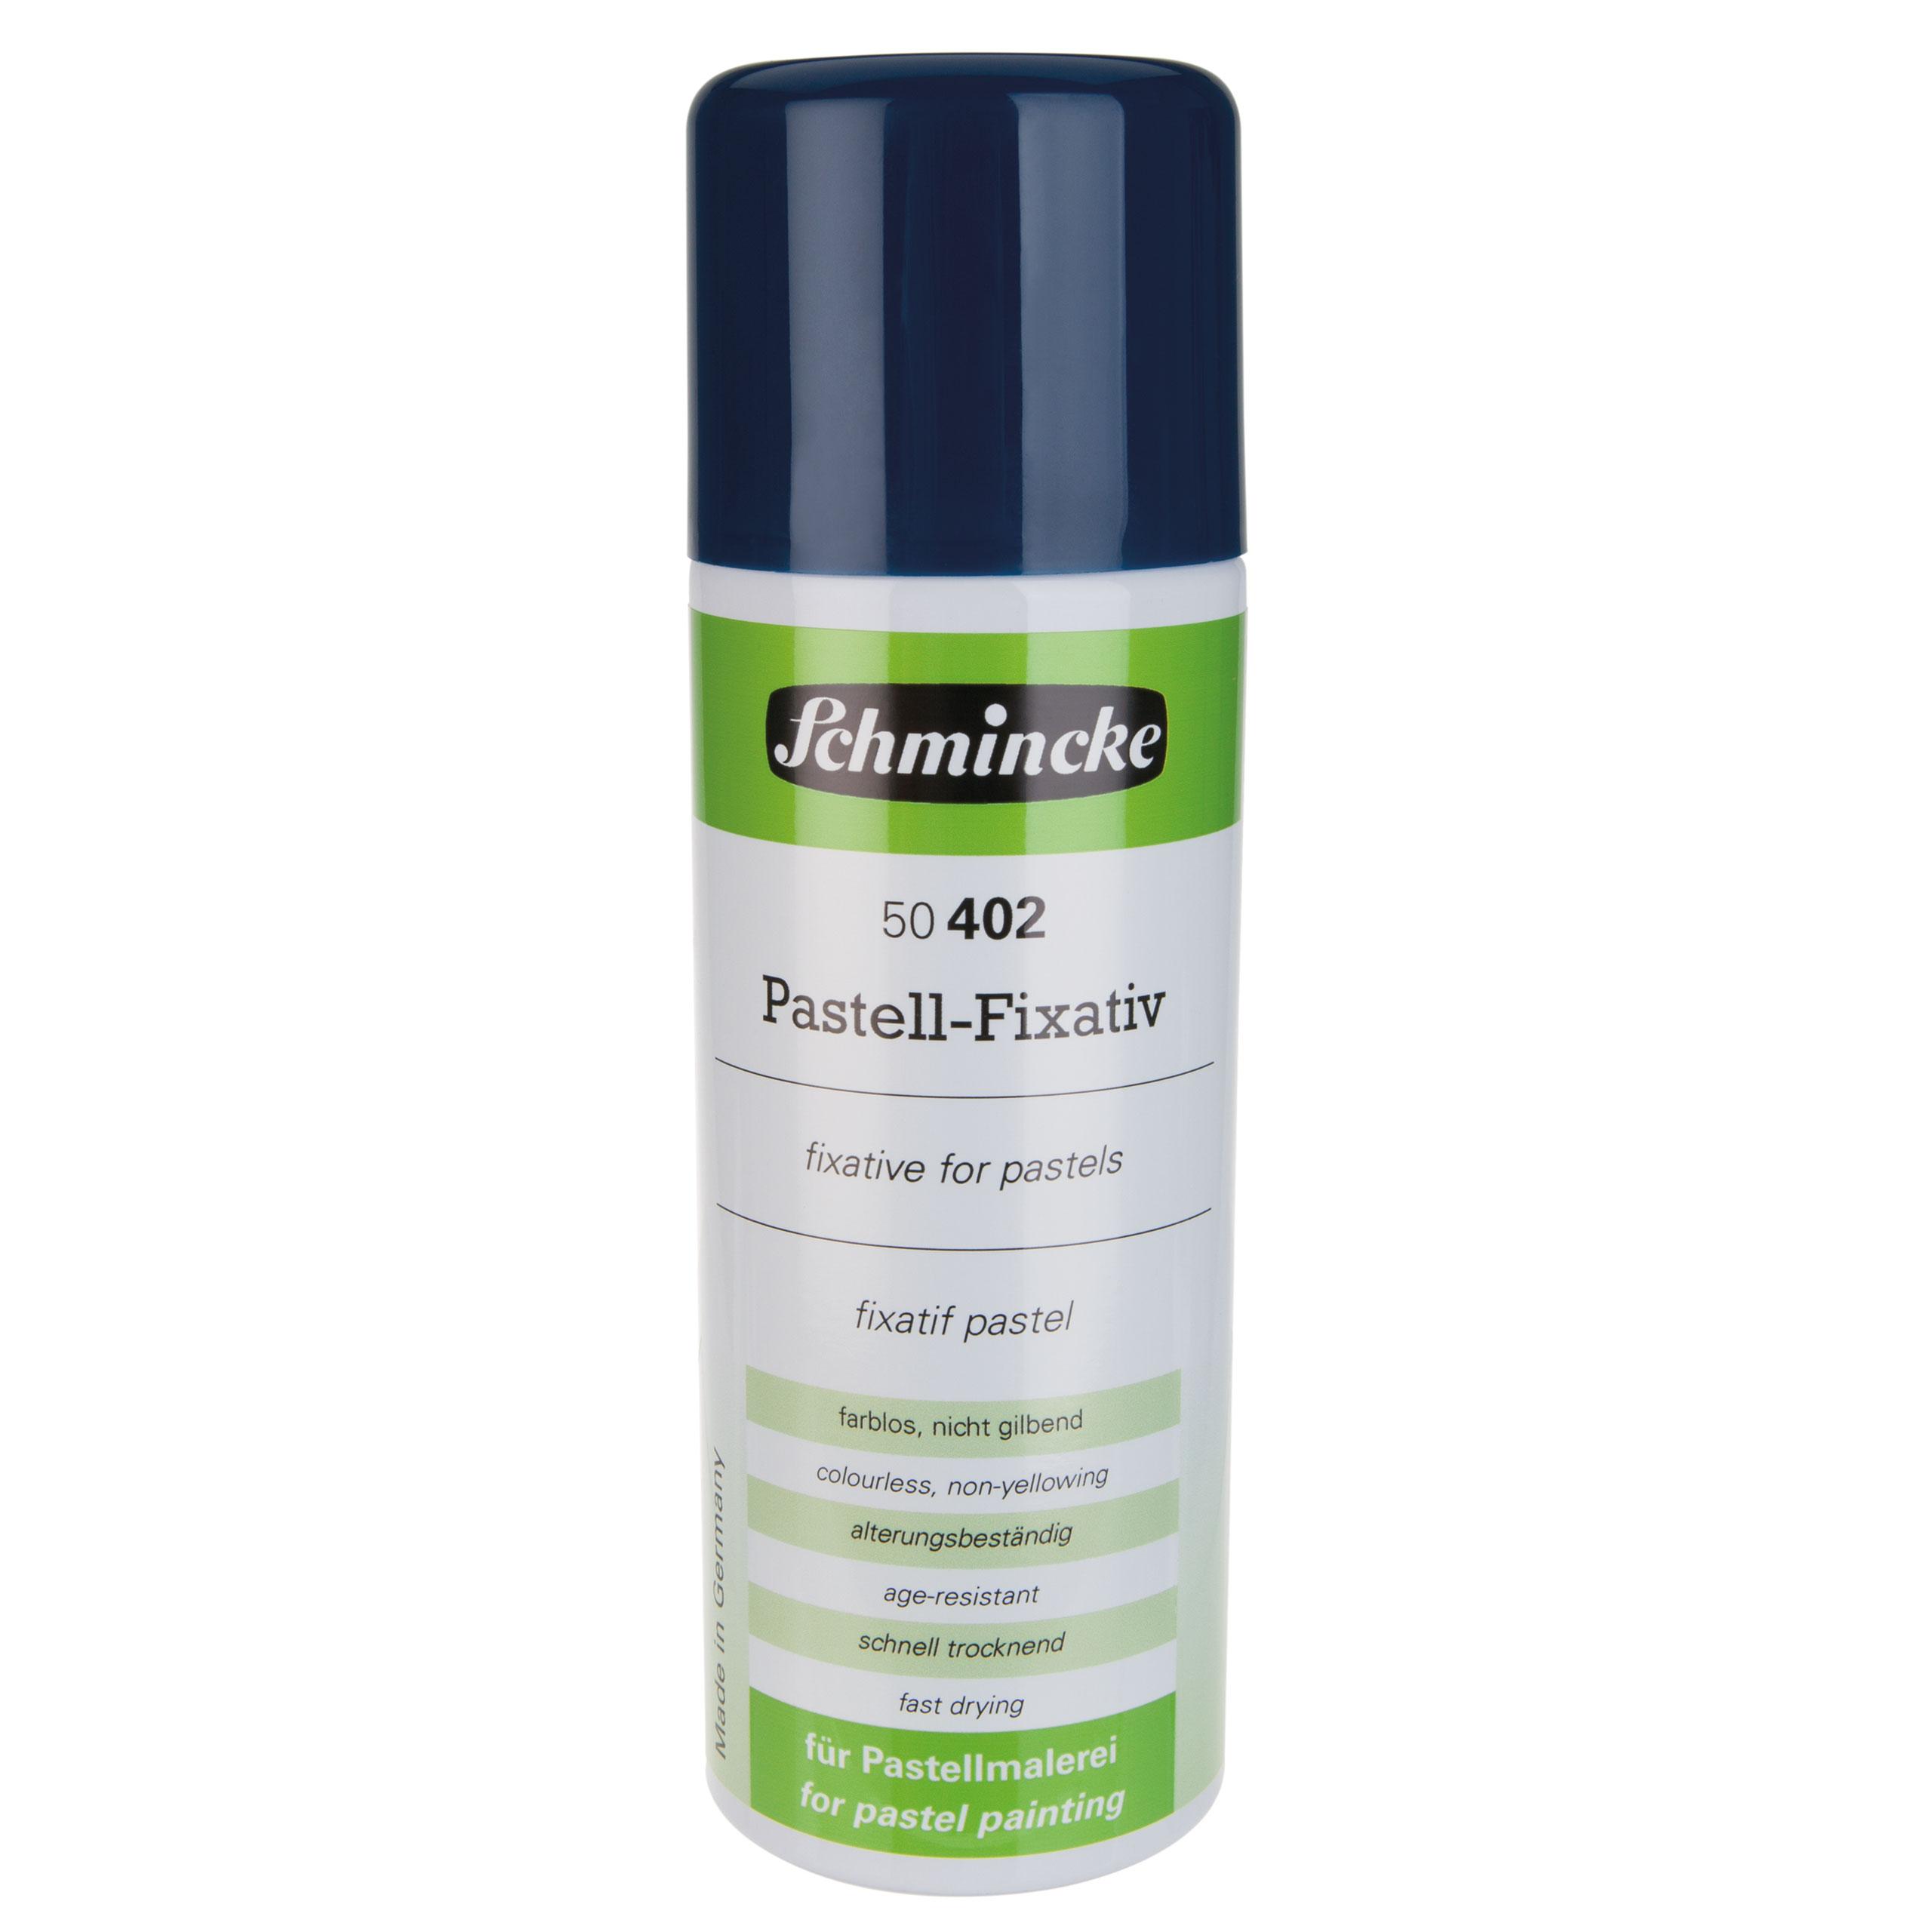 Pastell-Fixativ AEROSPRAY - 300ml Pastell Hilfsmittel Schmincke 50 402 040